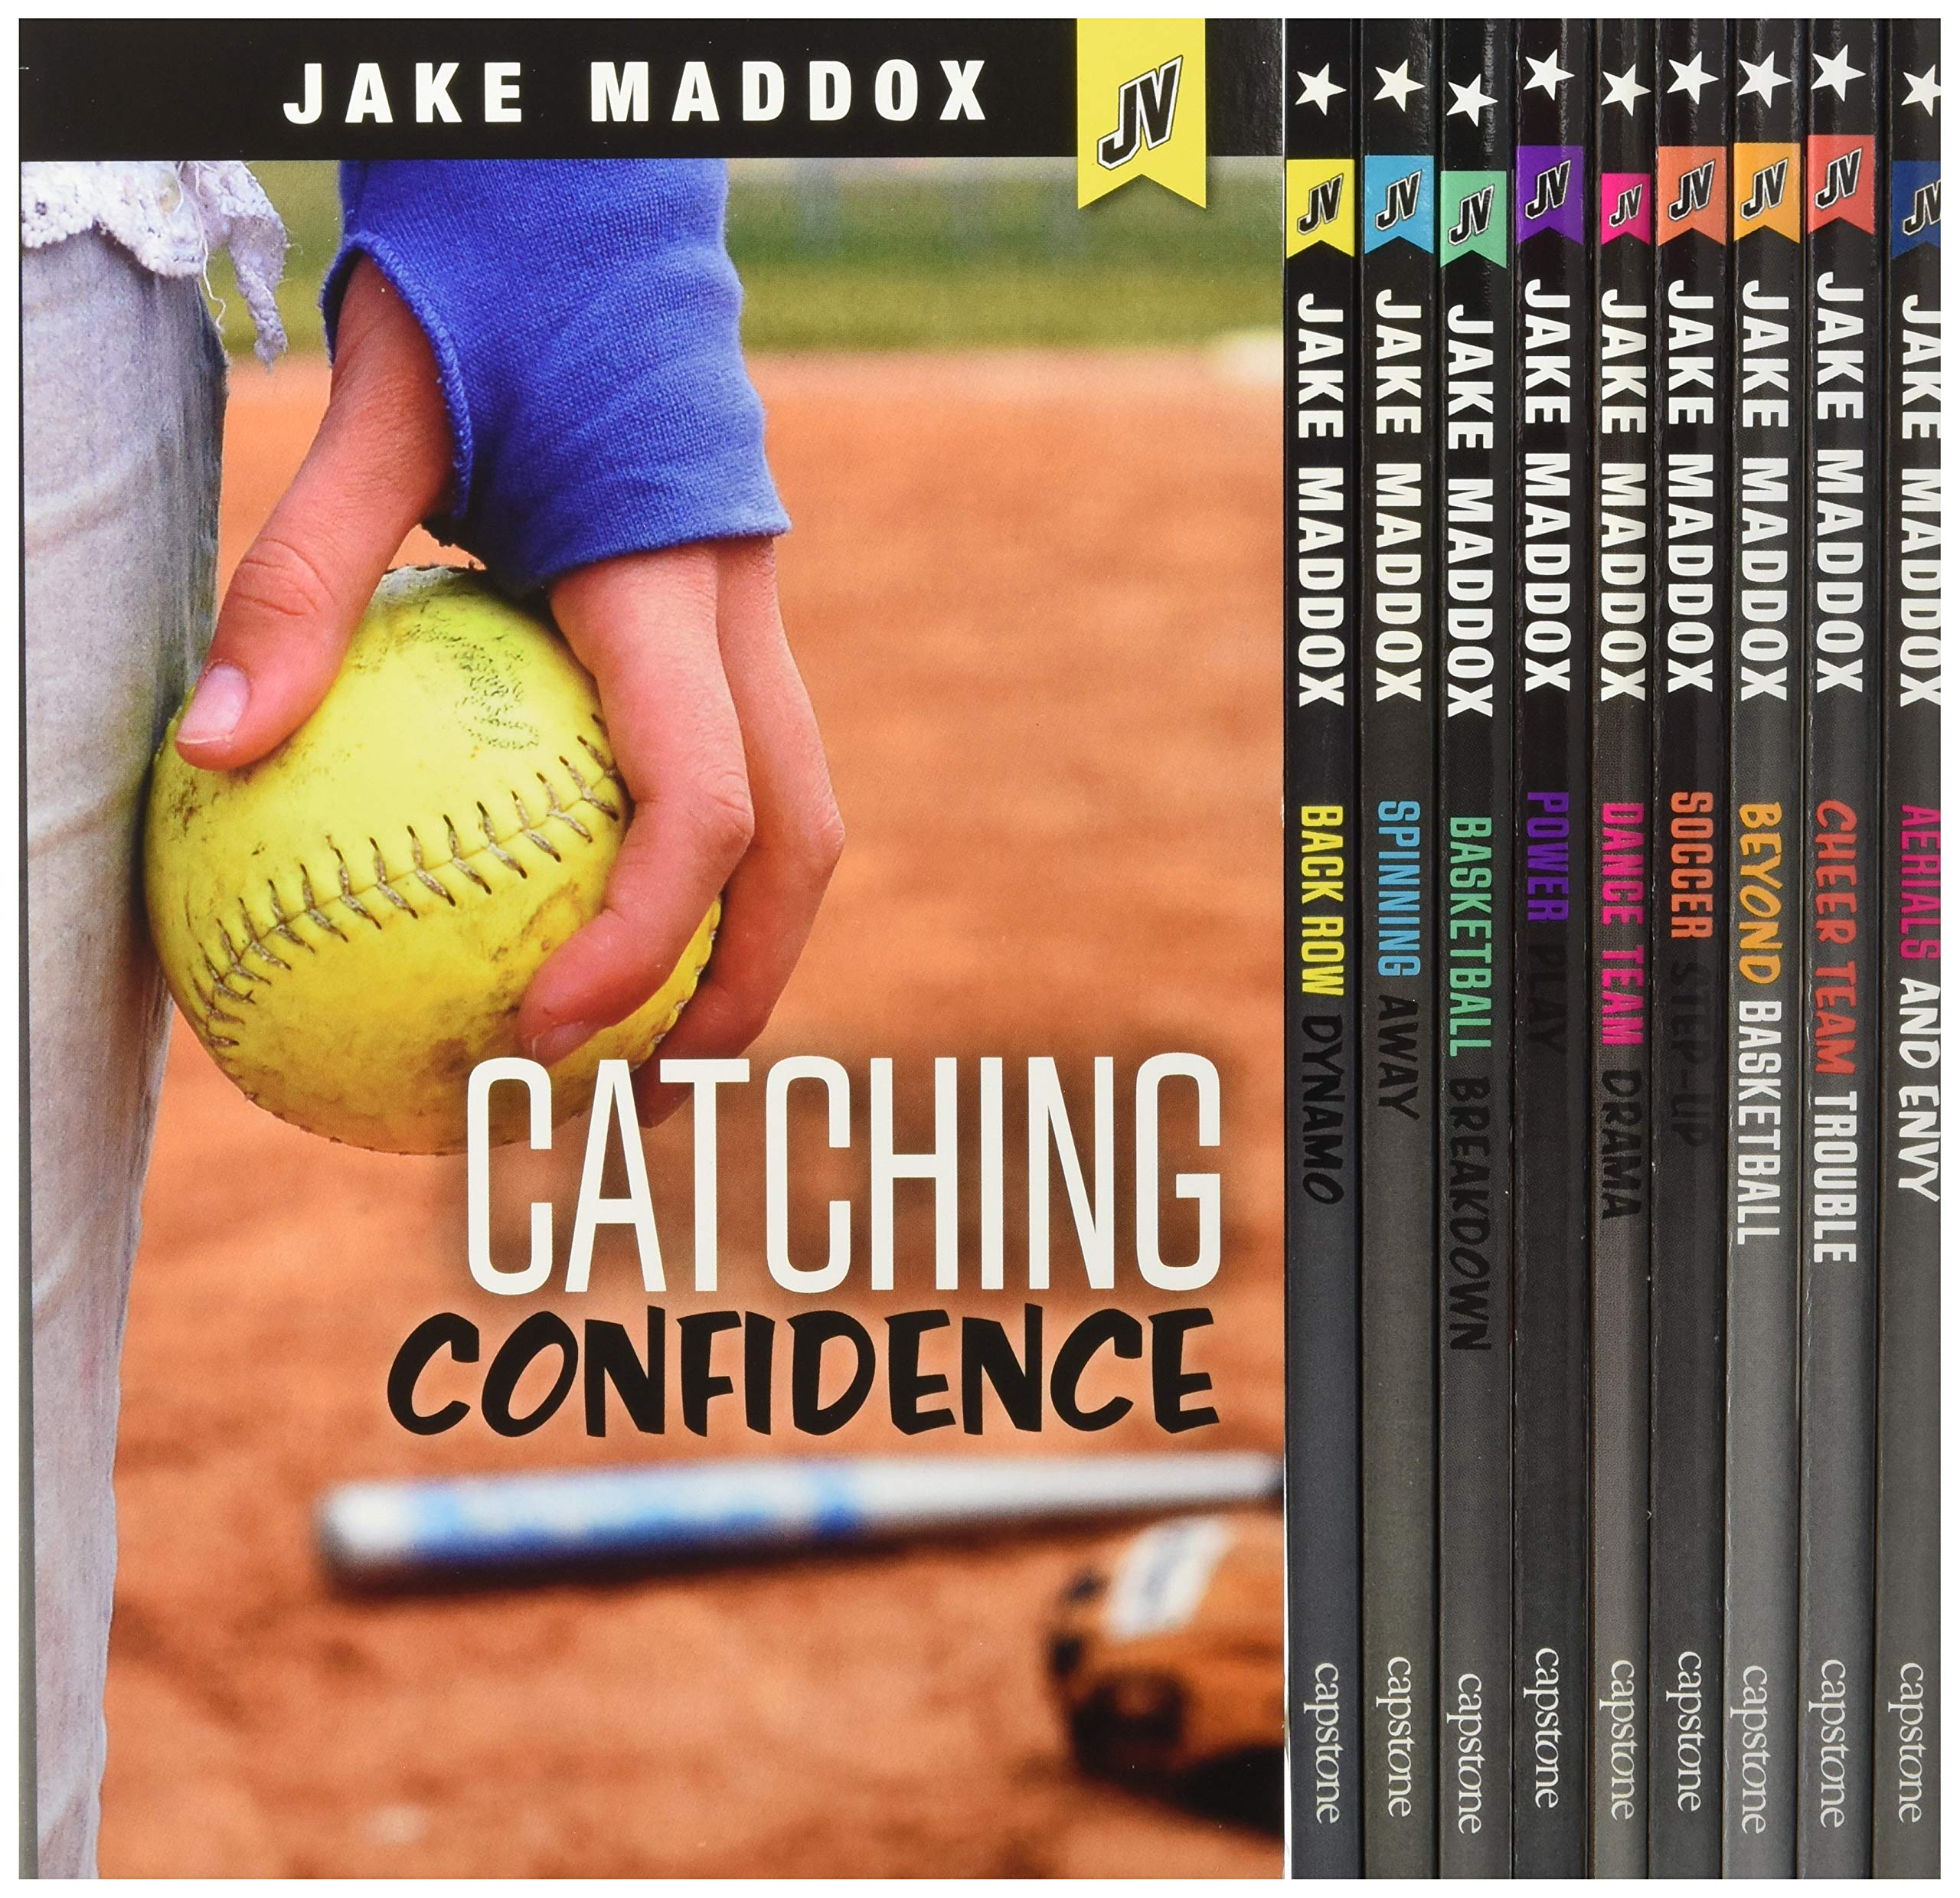 Jake Maddox Jv Girls: Amazon.es: Maddox, Jake: Libros en idiomas extranjeros